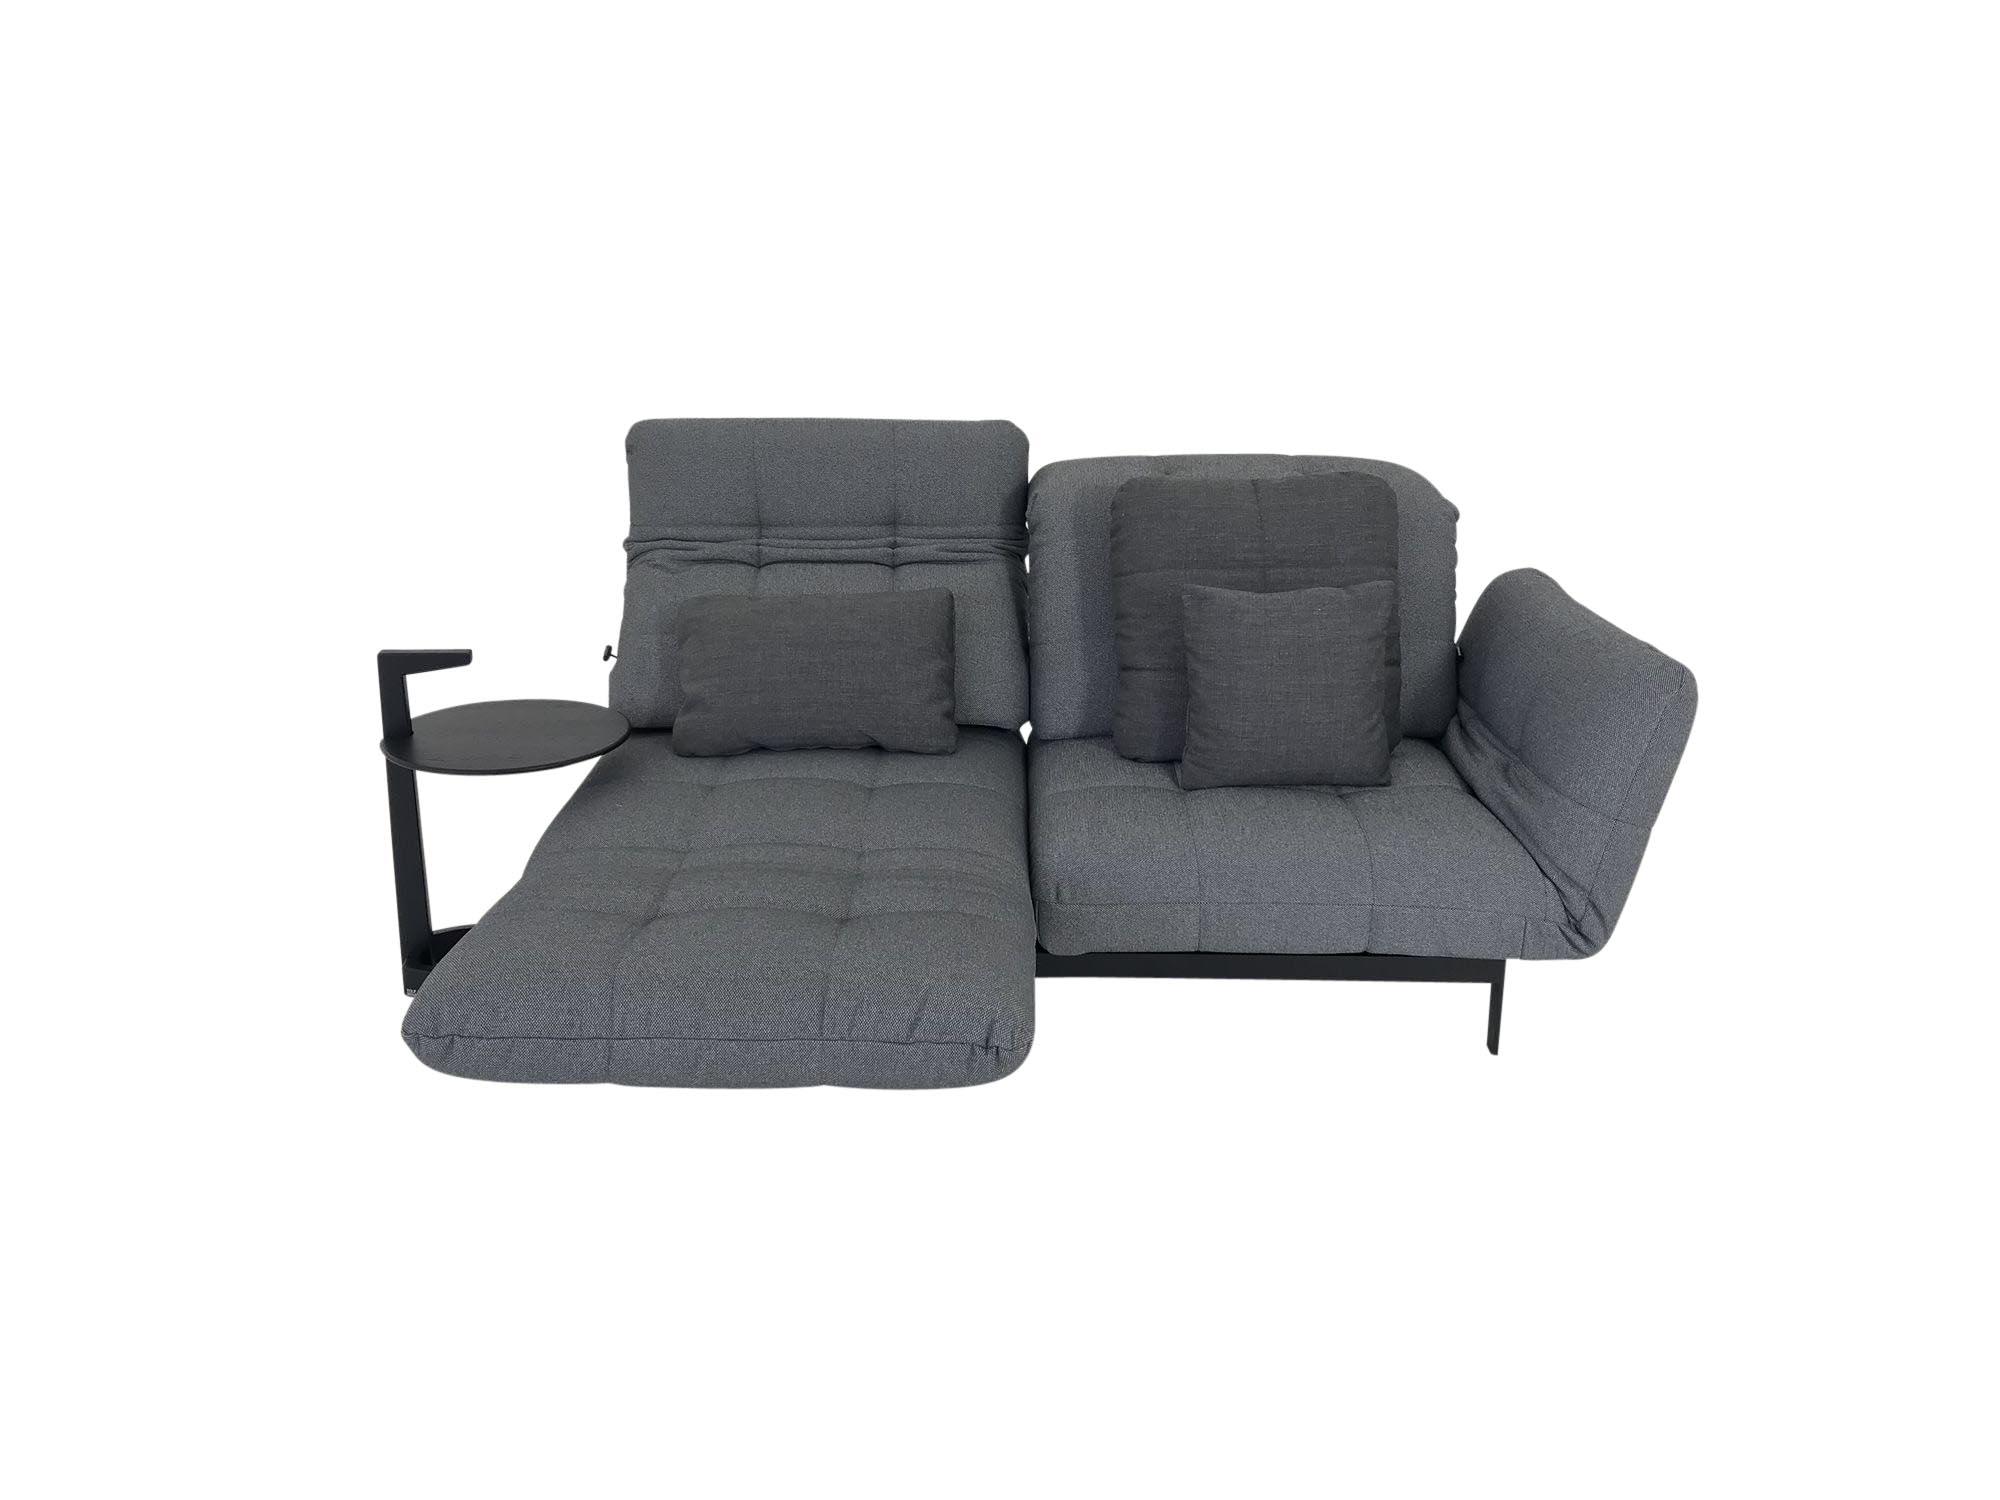 agio rolf benz sofas g nstig online kaufen bei izabela k. Black Bedroom Furniture Sets. Home Design Ideas